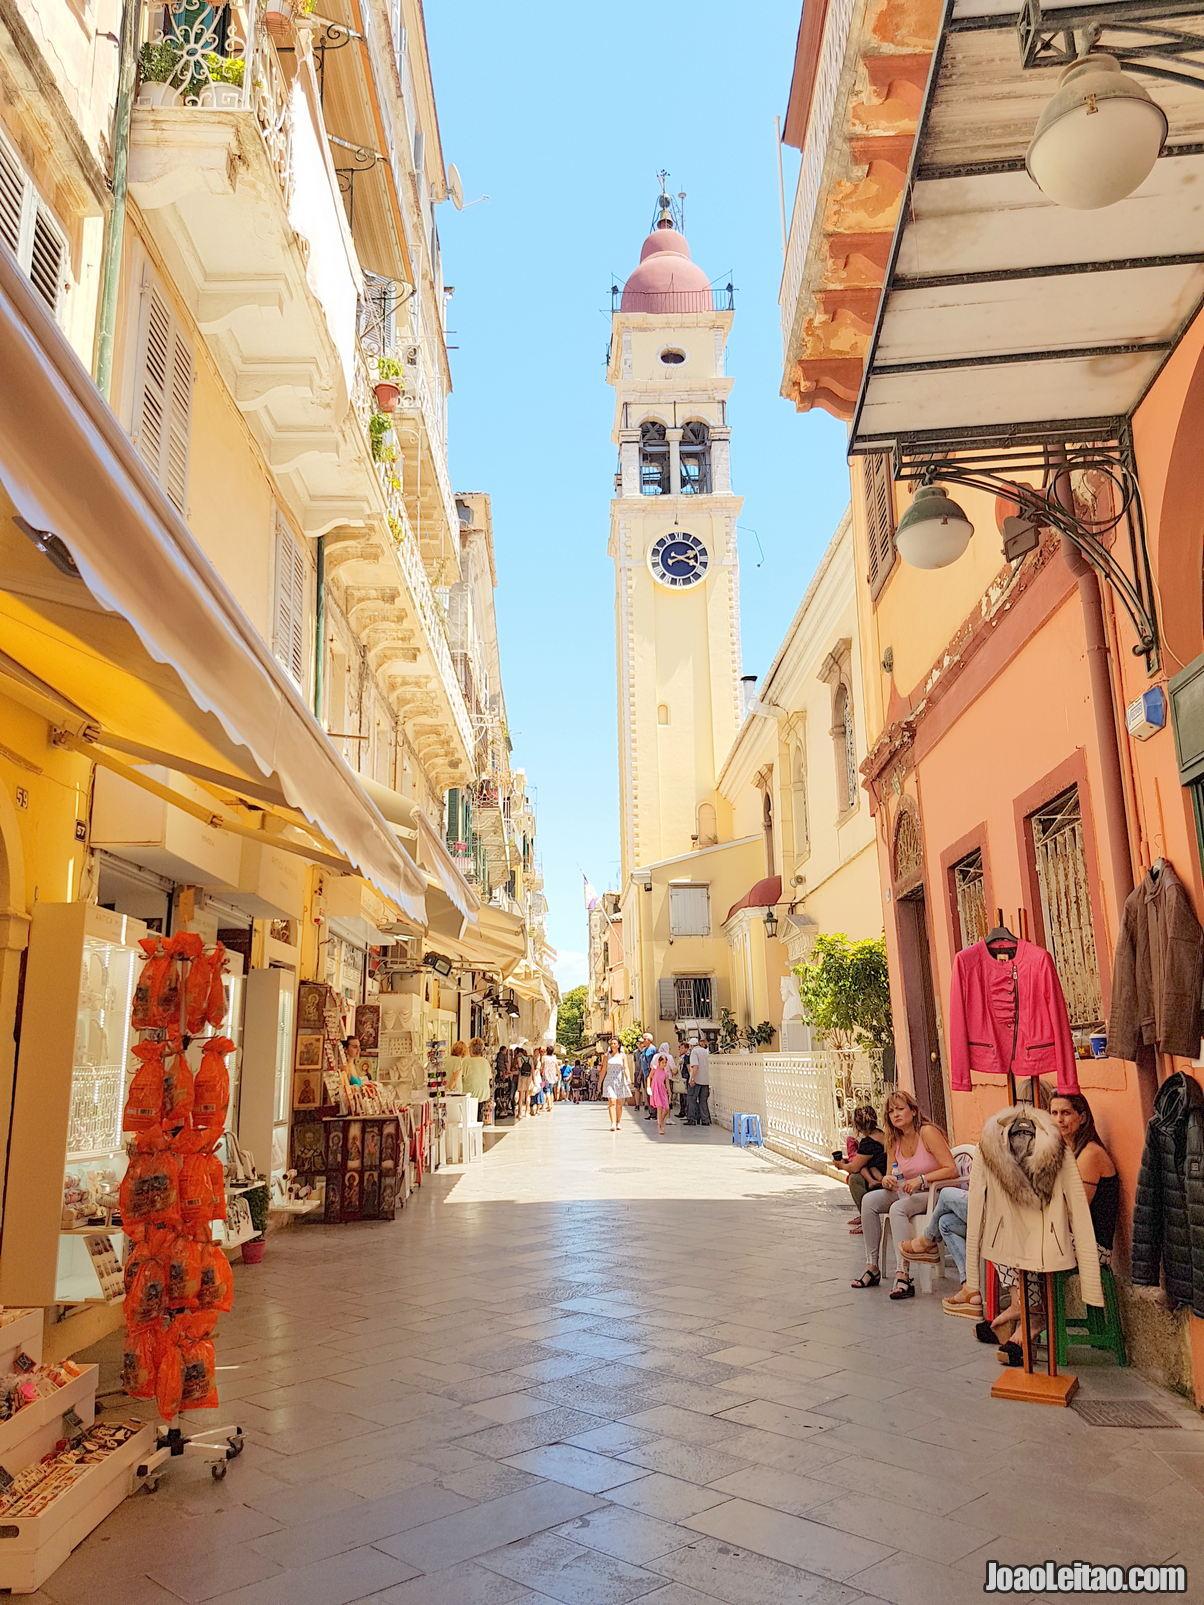 Vlassopoulou Theano street with Saint Spyridon Church in Corfu